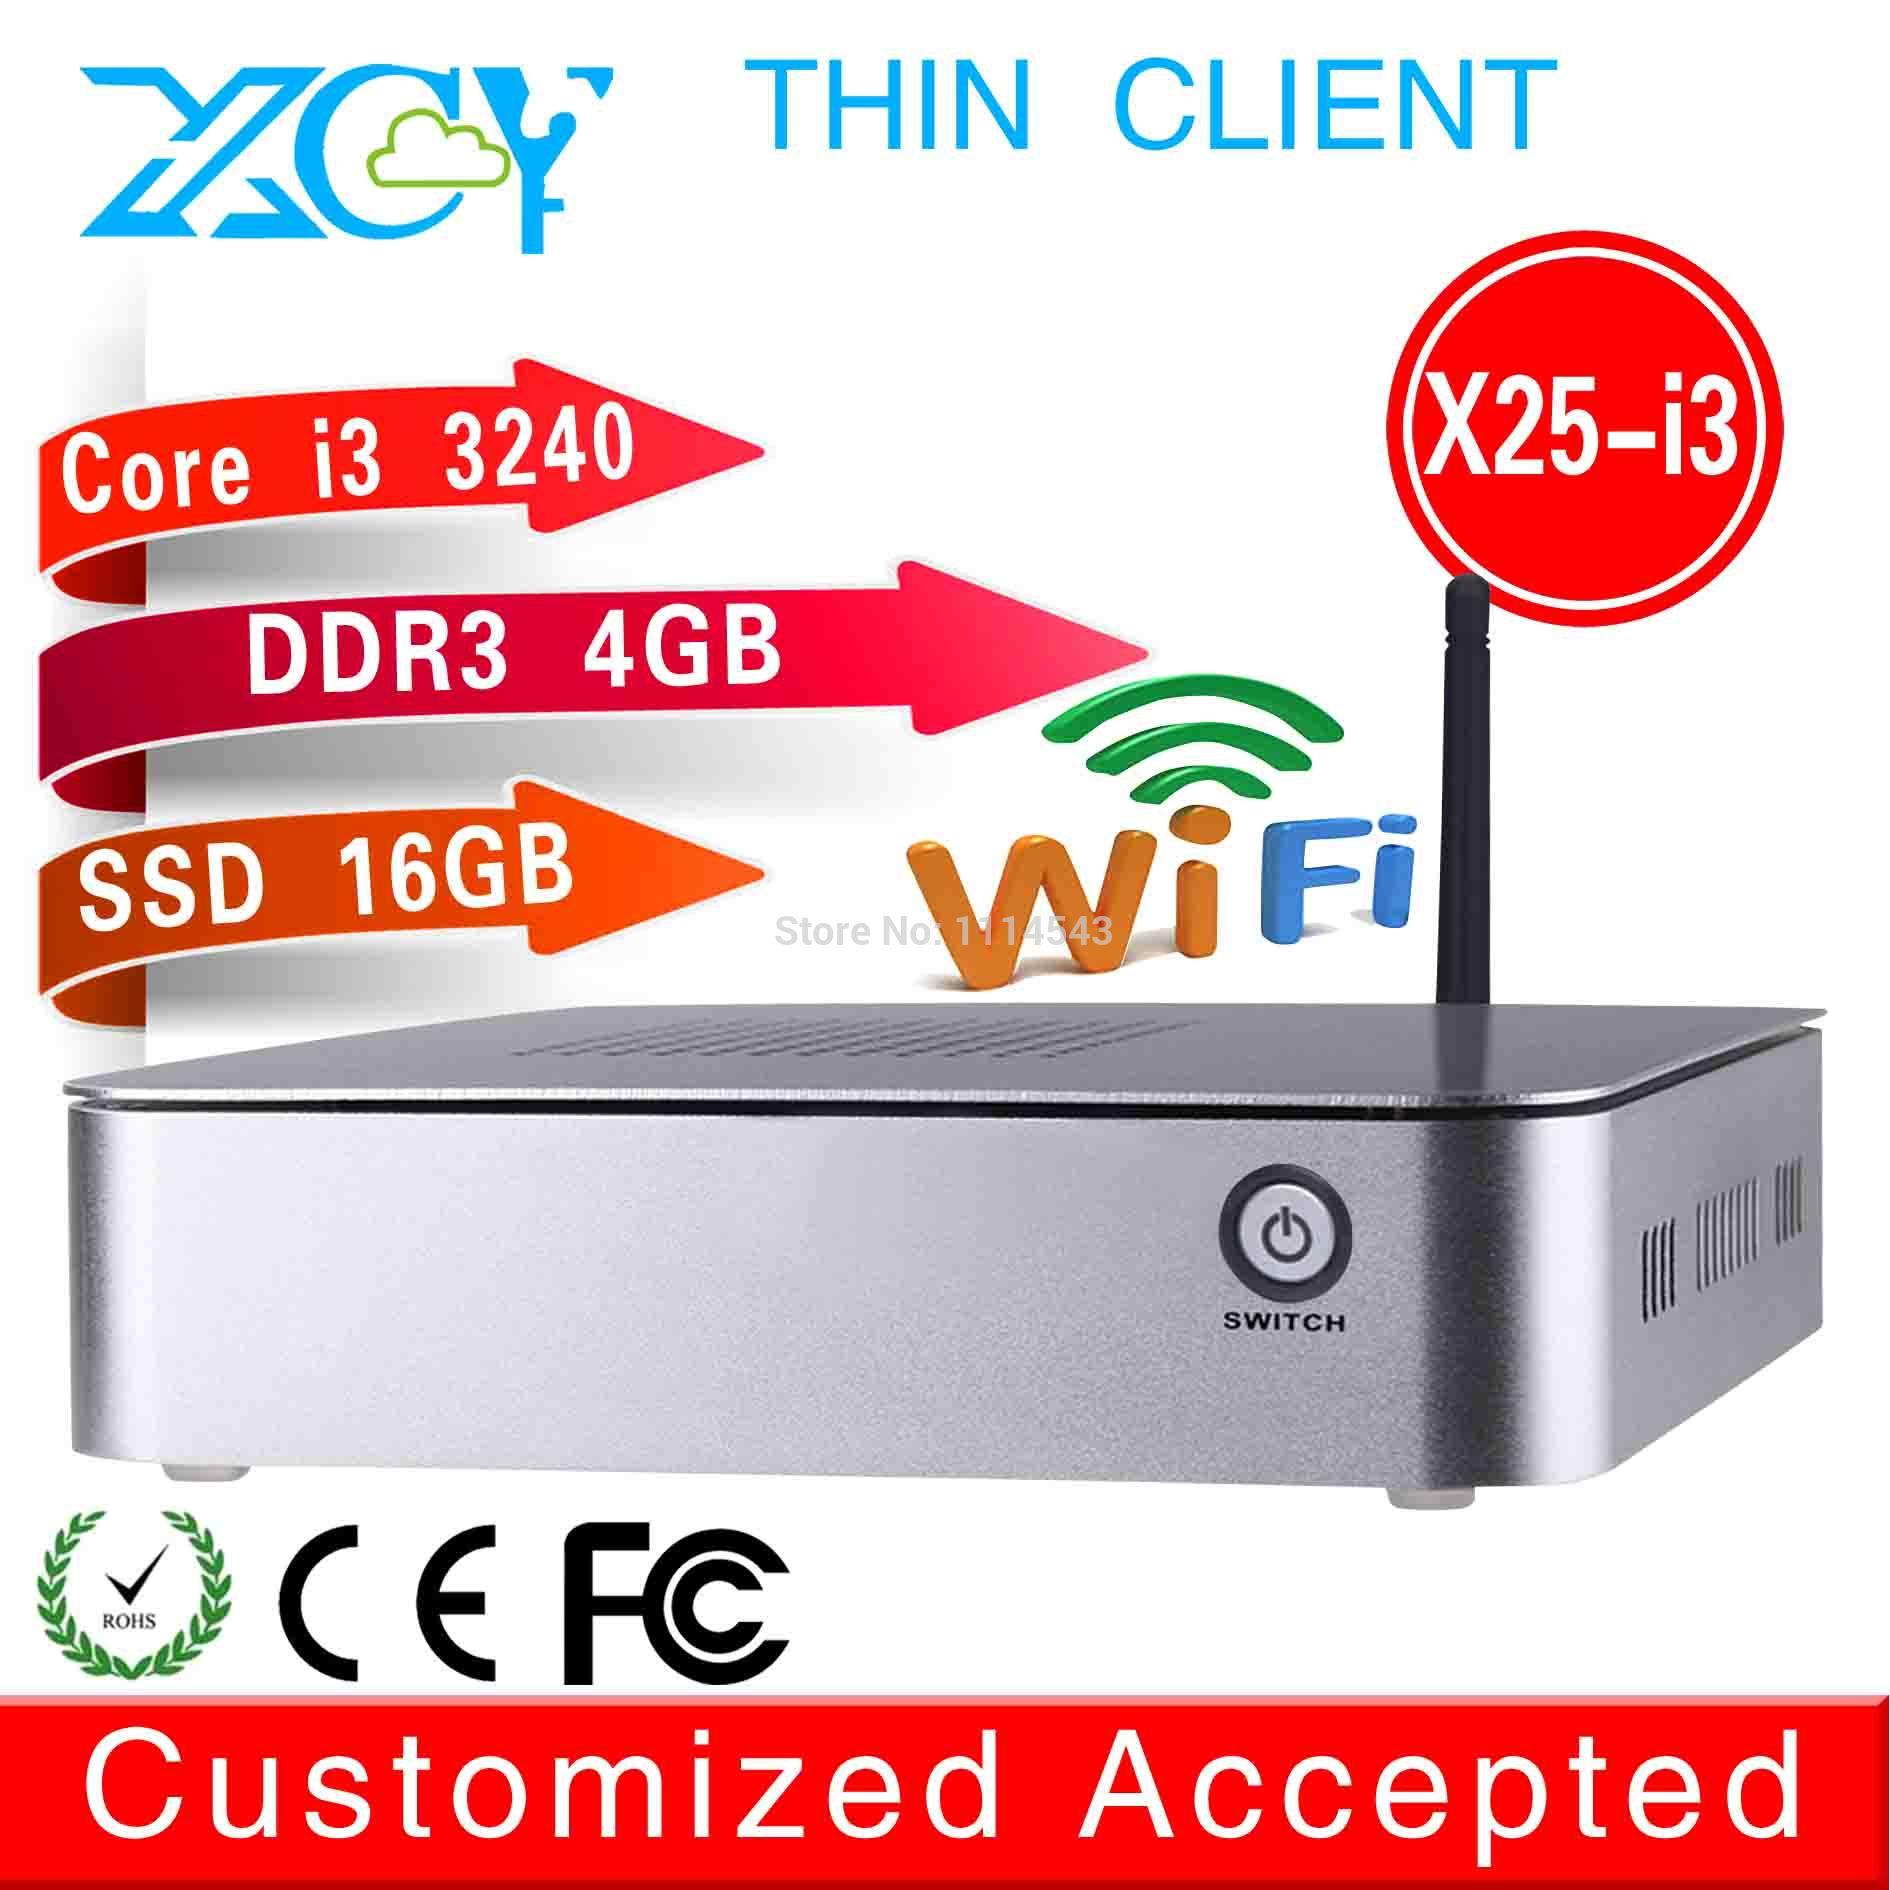 XCY core i3 3240/320 mini pc 4G RAM 16g ssd 3.2GHz thin client with 4*USB2.0 HDMI+VGA(China (Mainland))